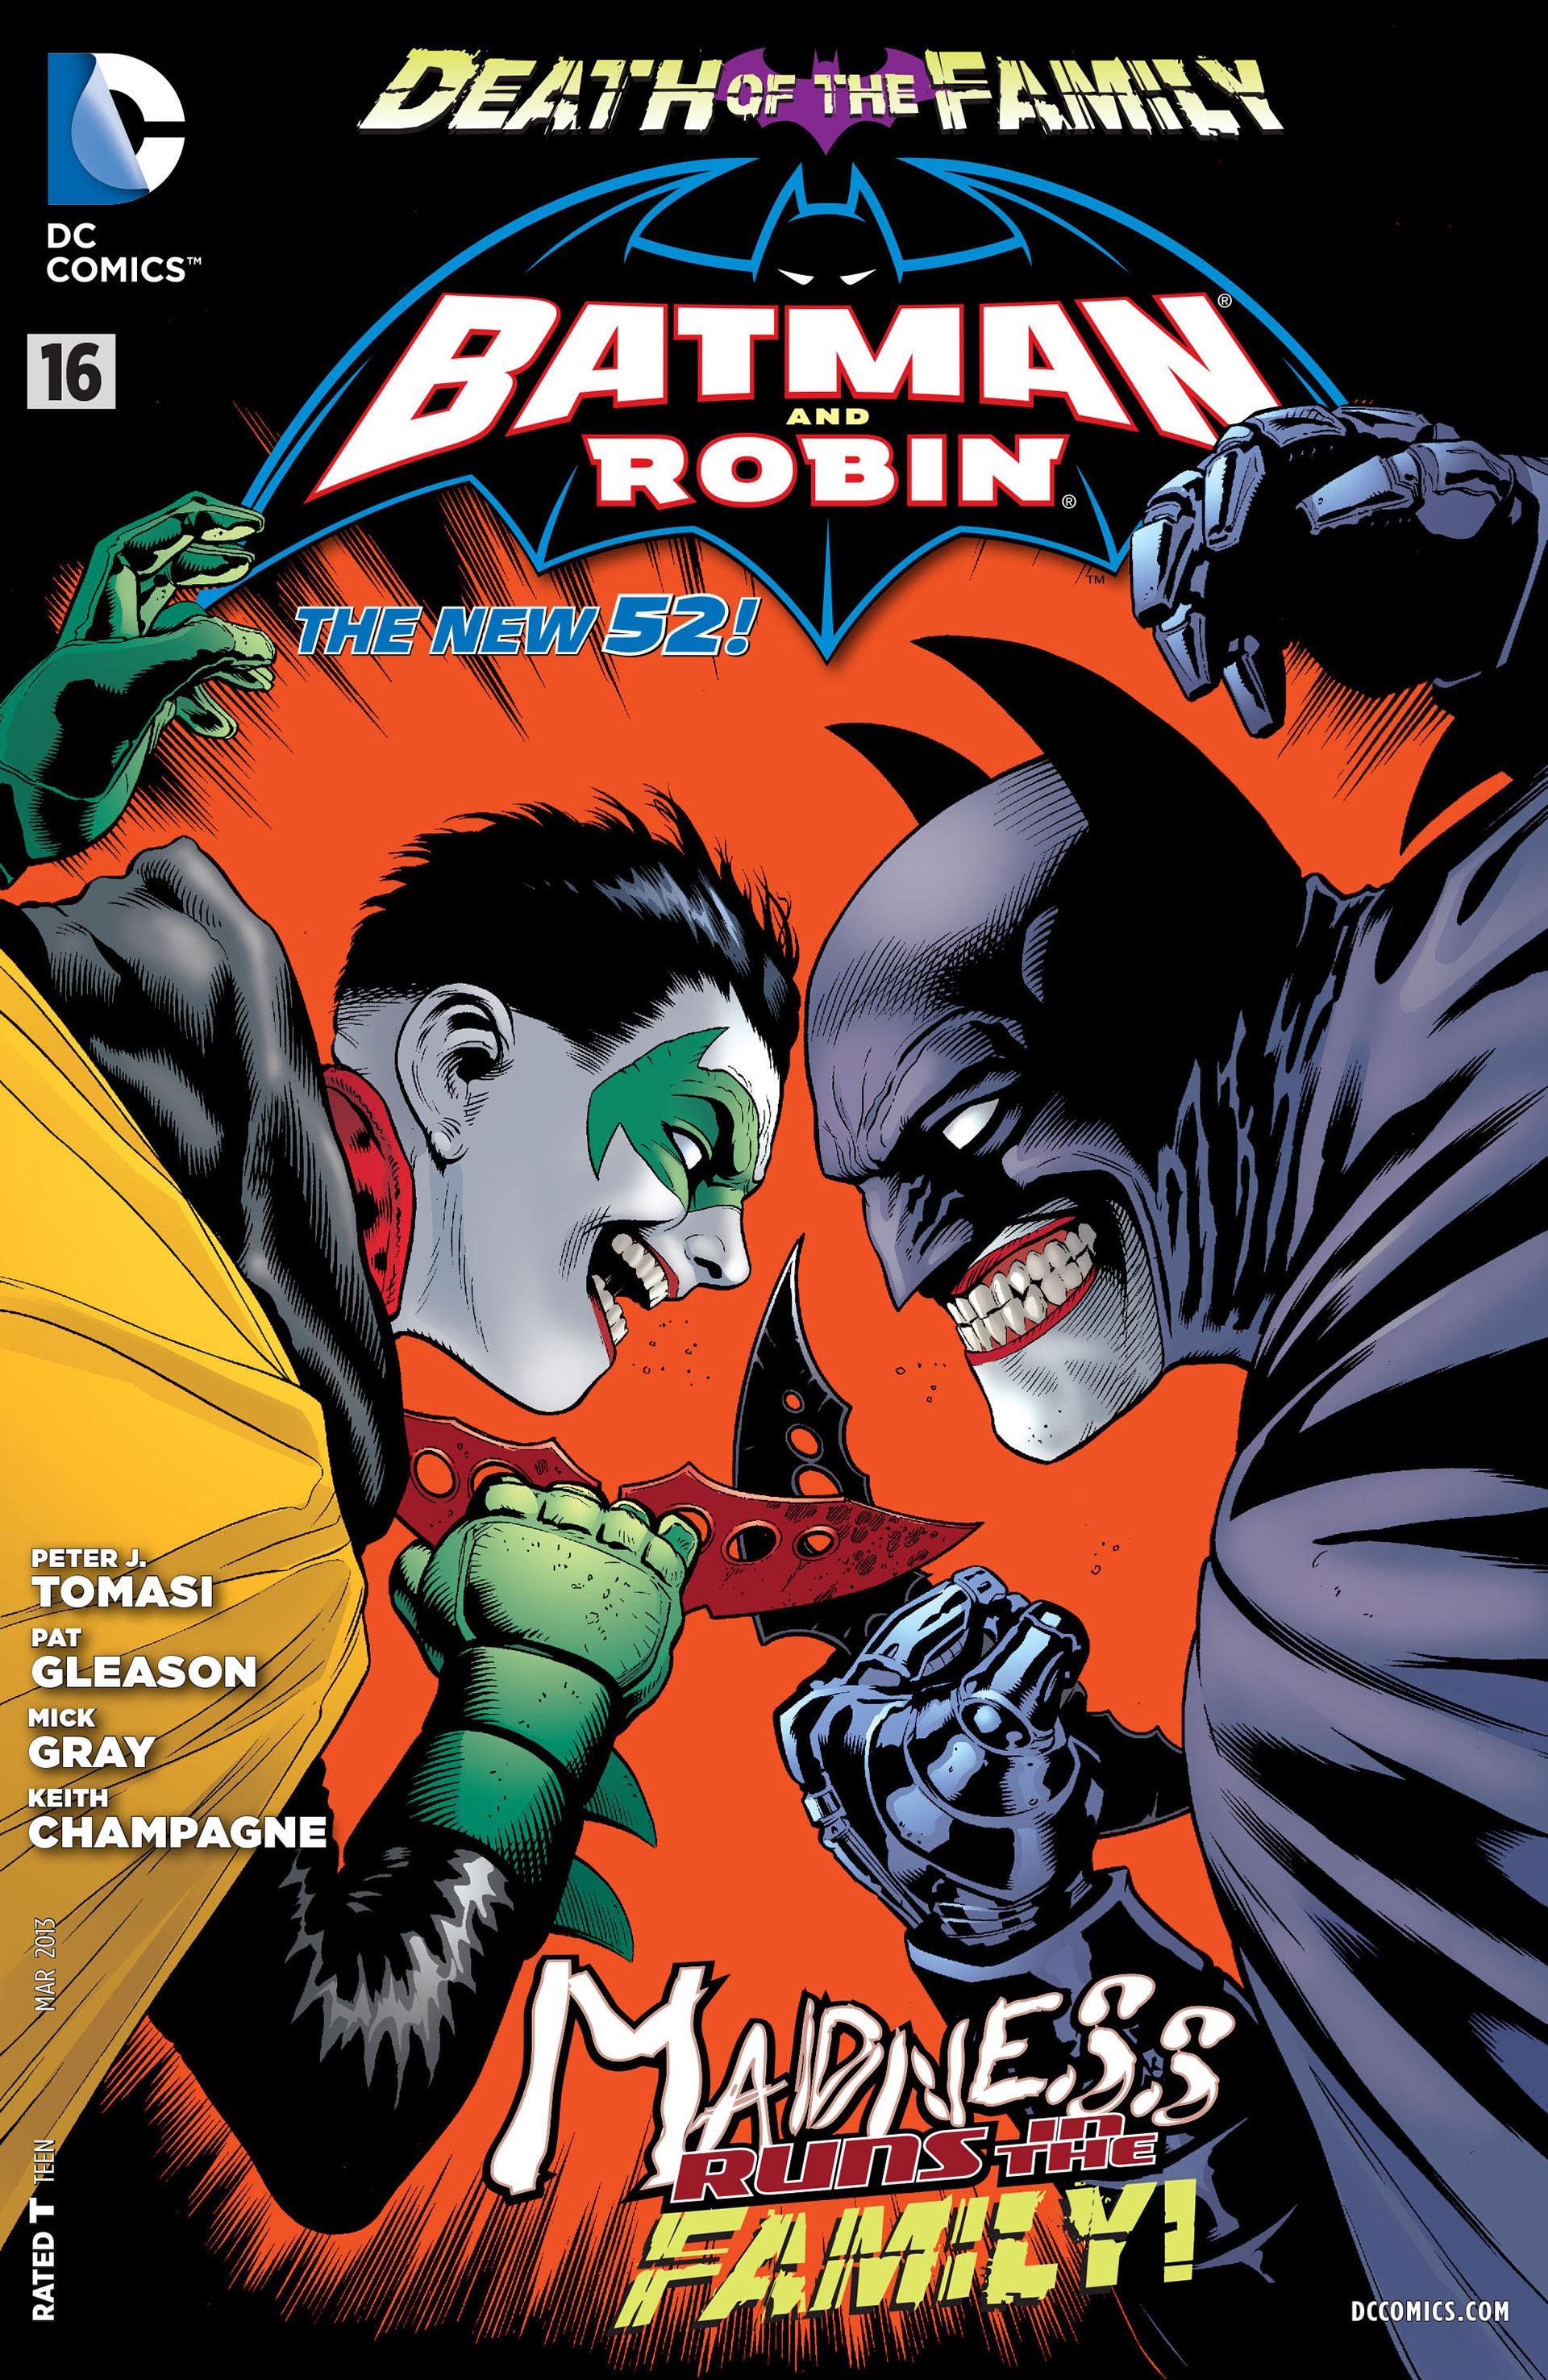 Batman and robin volume 2 issue 16 batman wiki fandom powered batman and robin volume 2 issue 16 fandeluxe Images